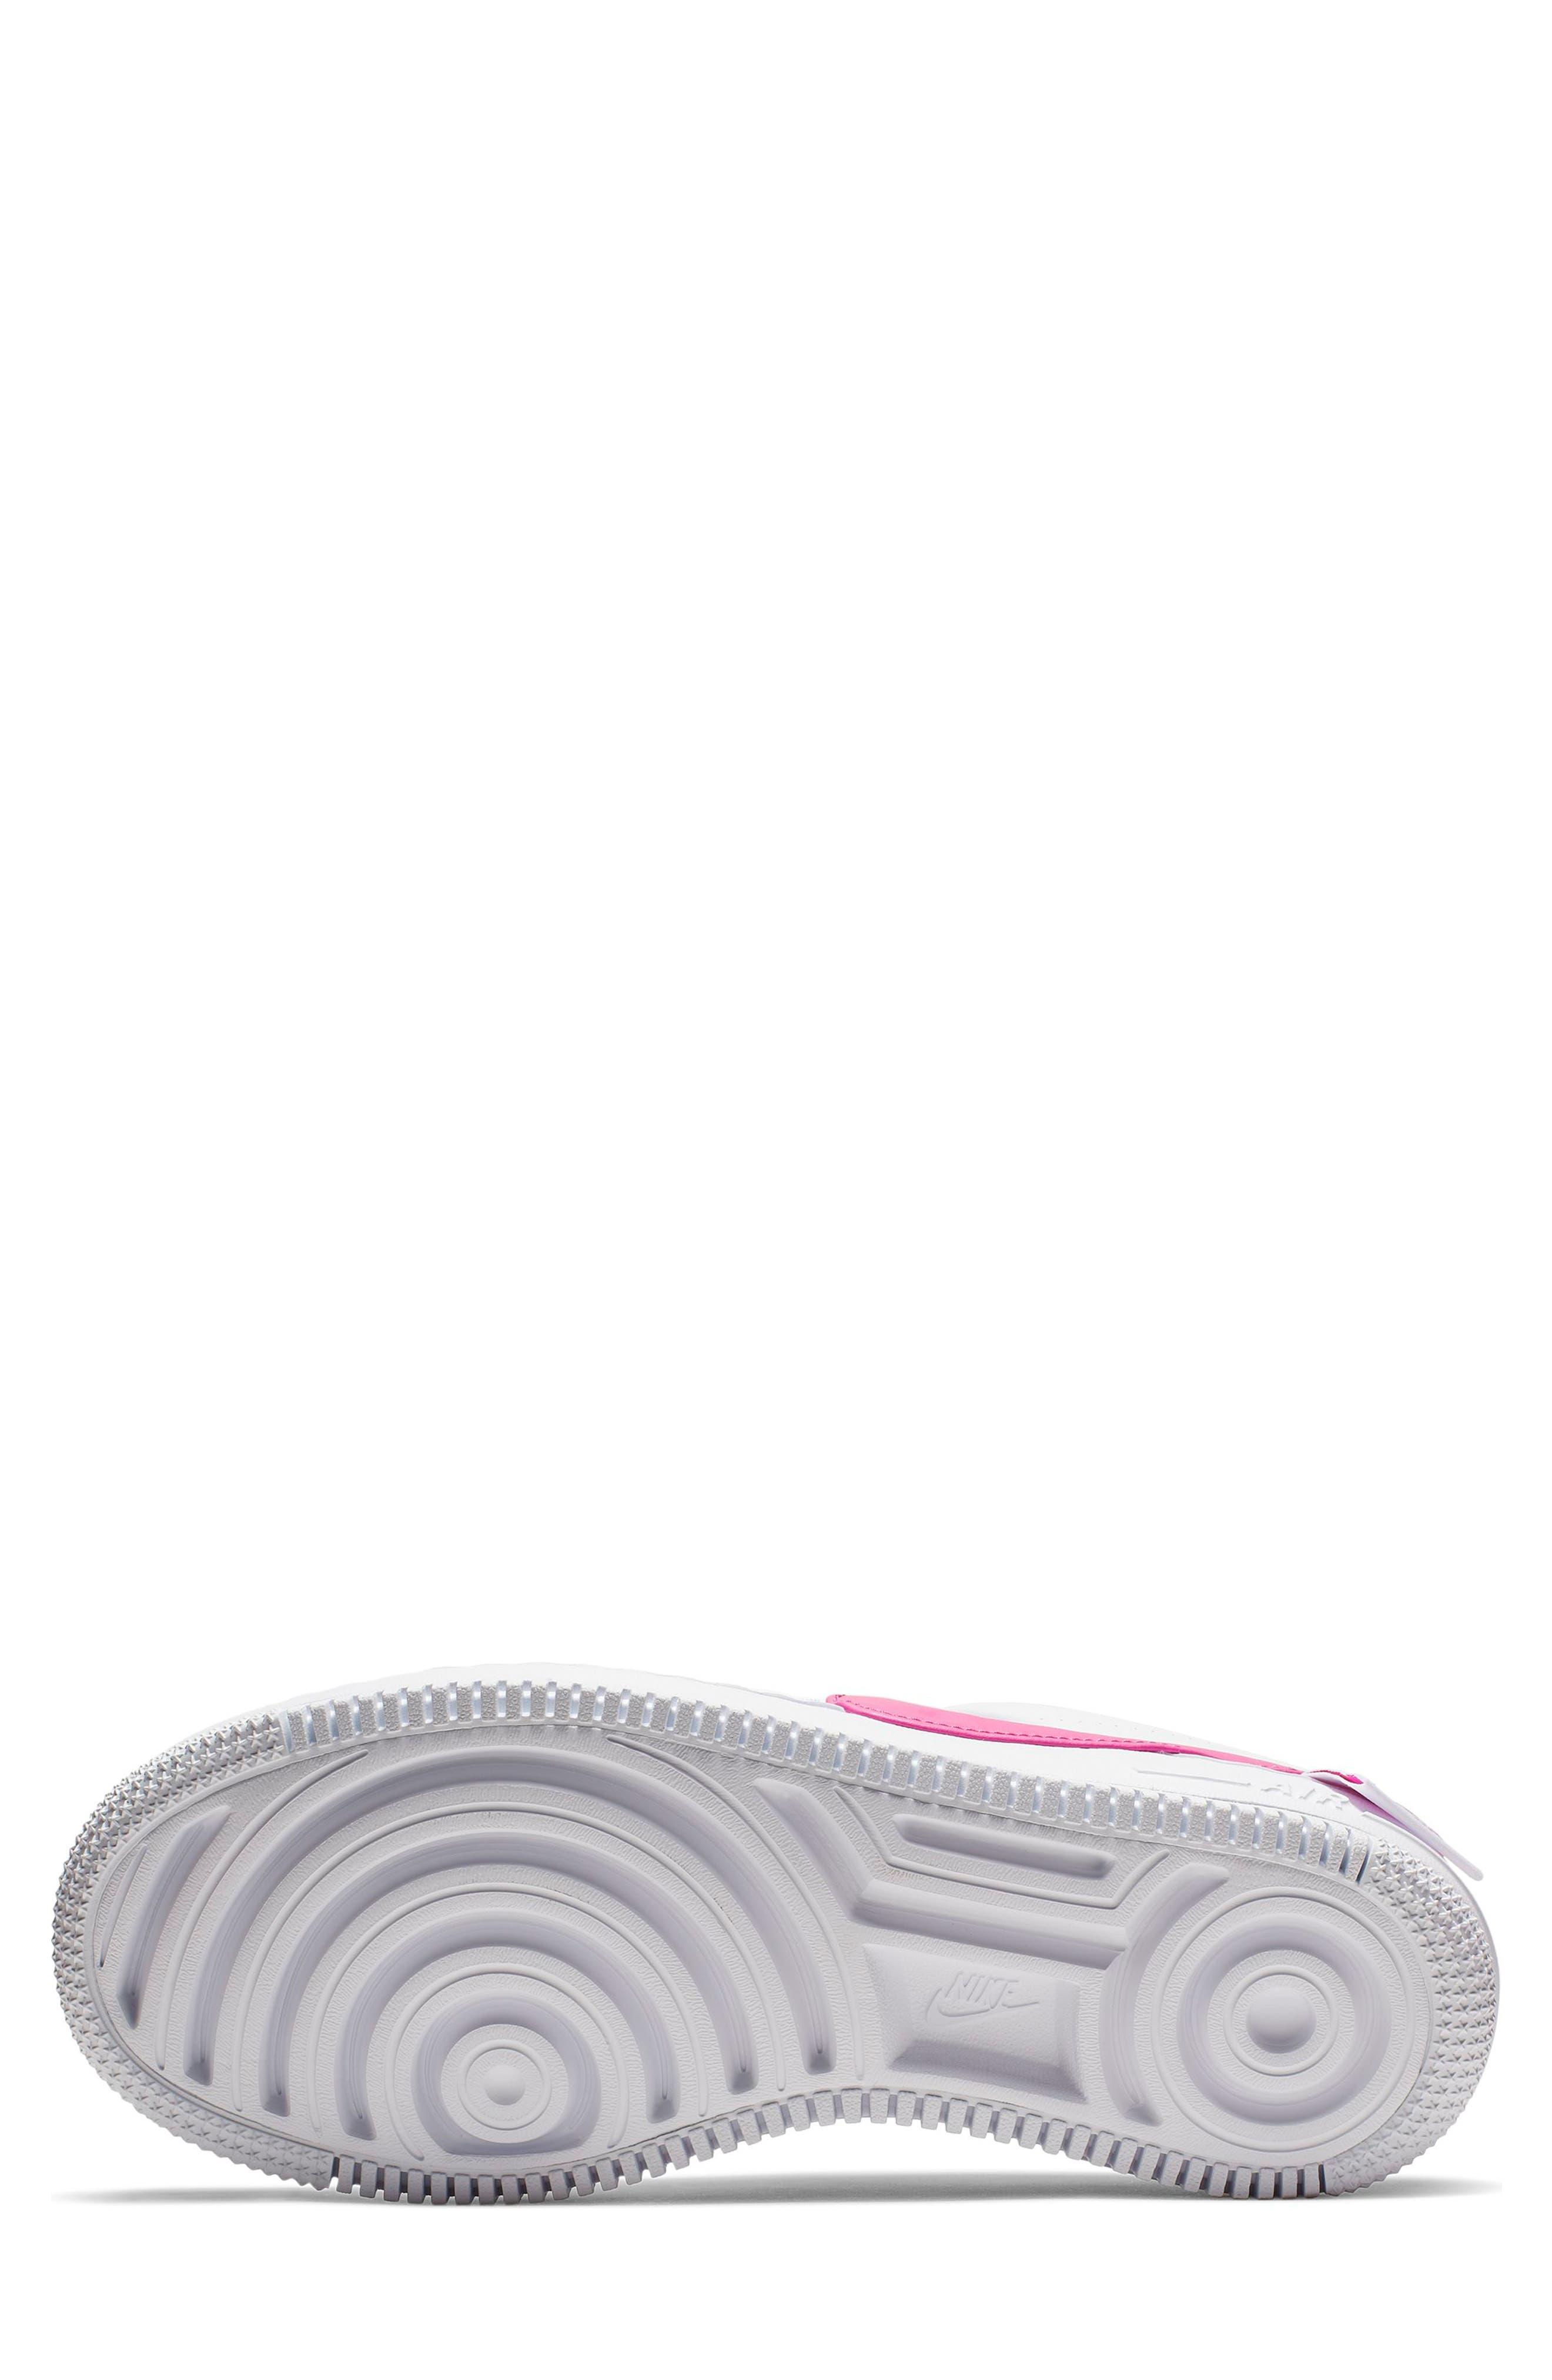 NIKE, Air Force 1 Jester XX Sneaker, Alternate thumbnail 5, color, WHITE/ LASER FUCHSIA